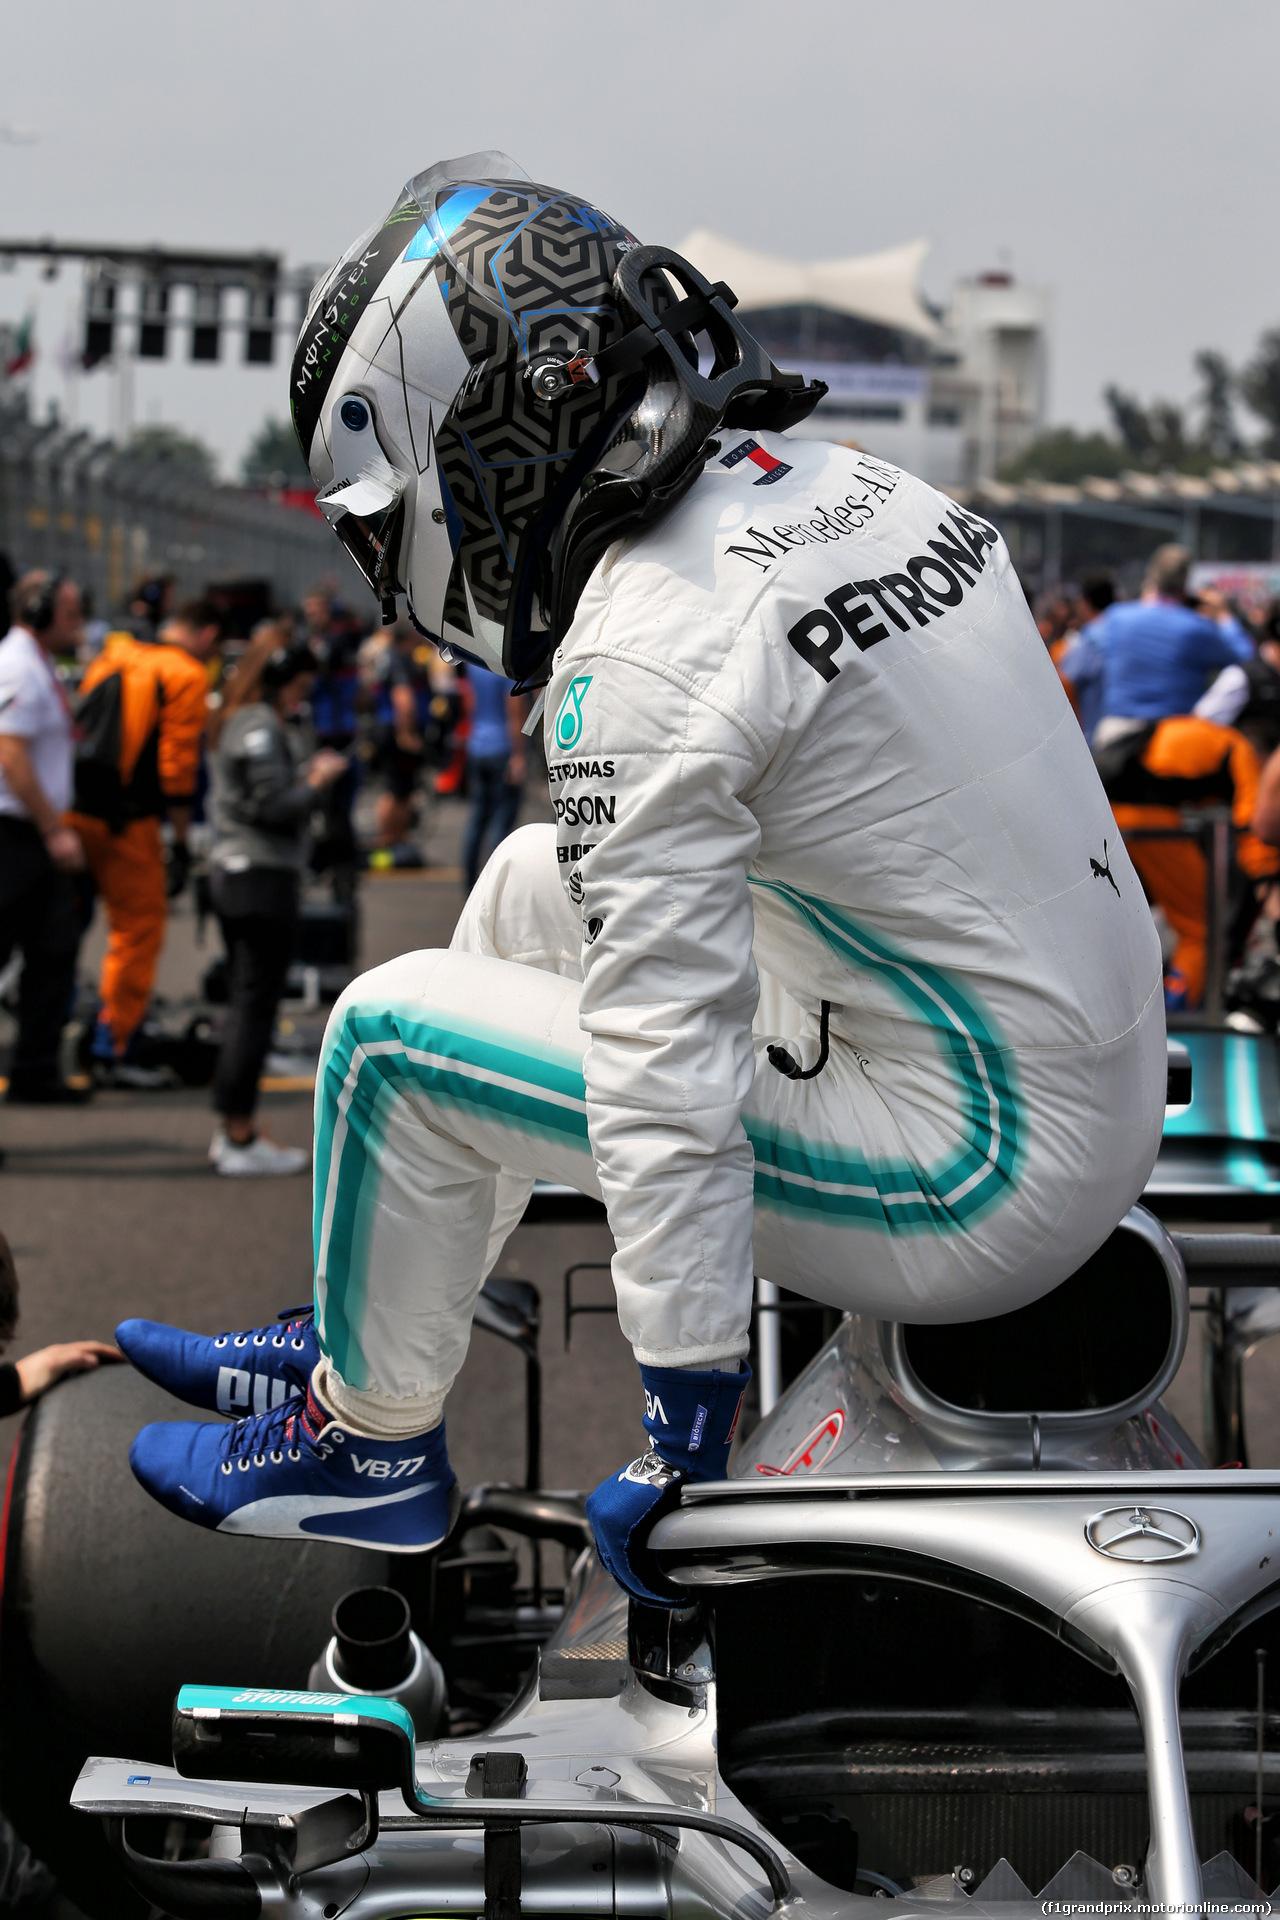 GP MESSICO, Valtteri Bottas (FIN) Mercedes AMG F1 W10 on the grid. 27.10.2019.